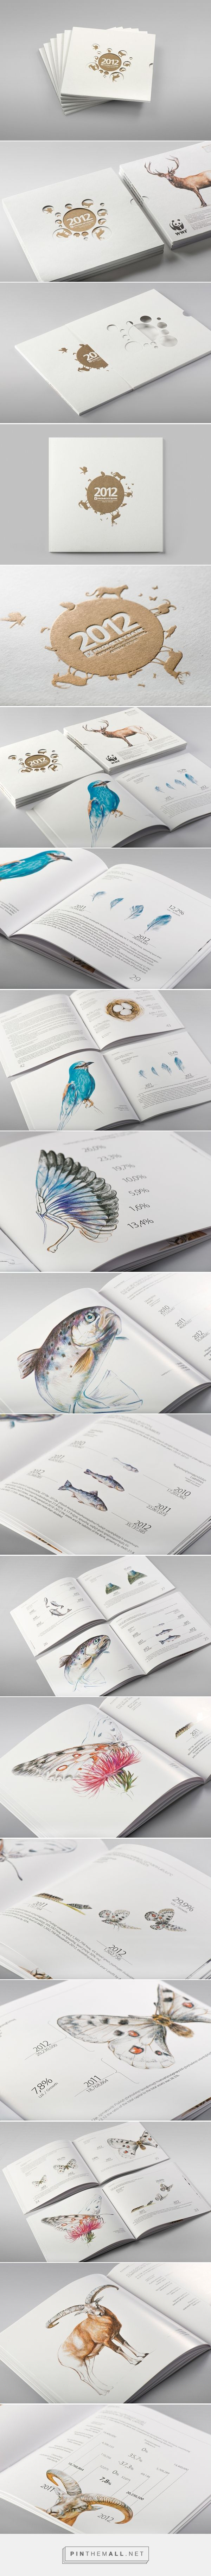 Prometey Bank Annual Report 2012 on Behance - created via https://pinthemall.net